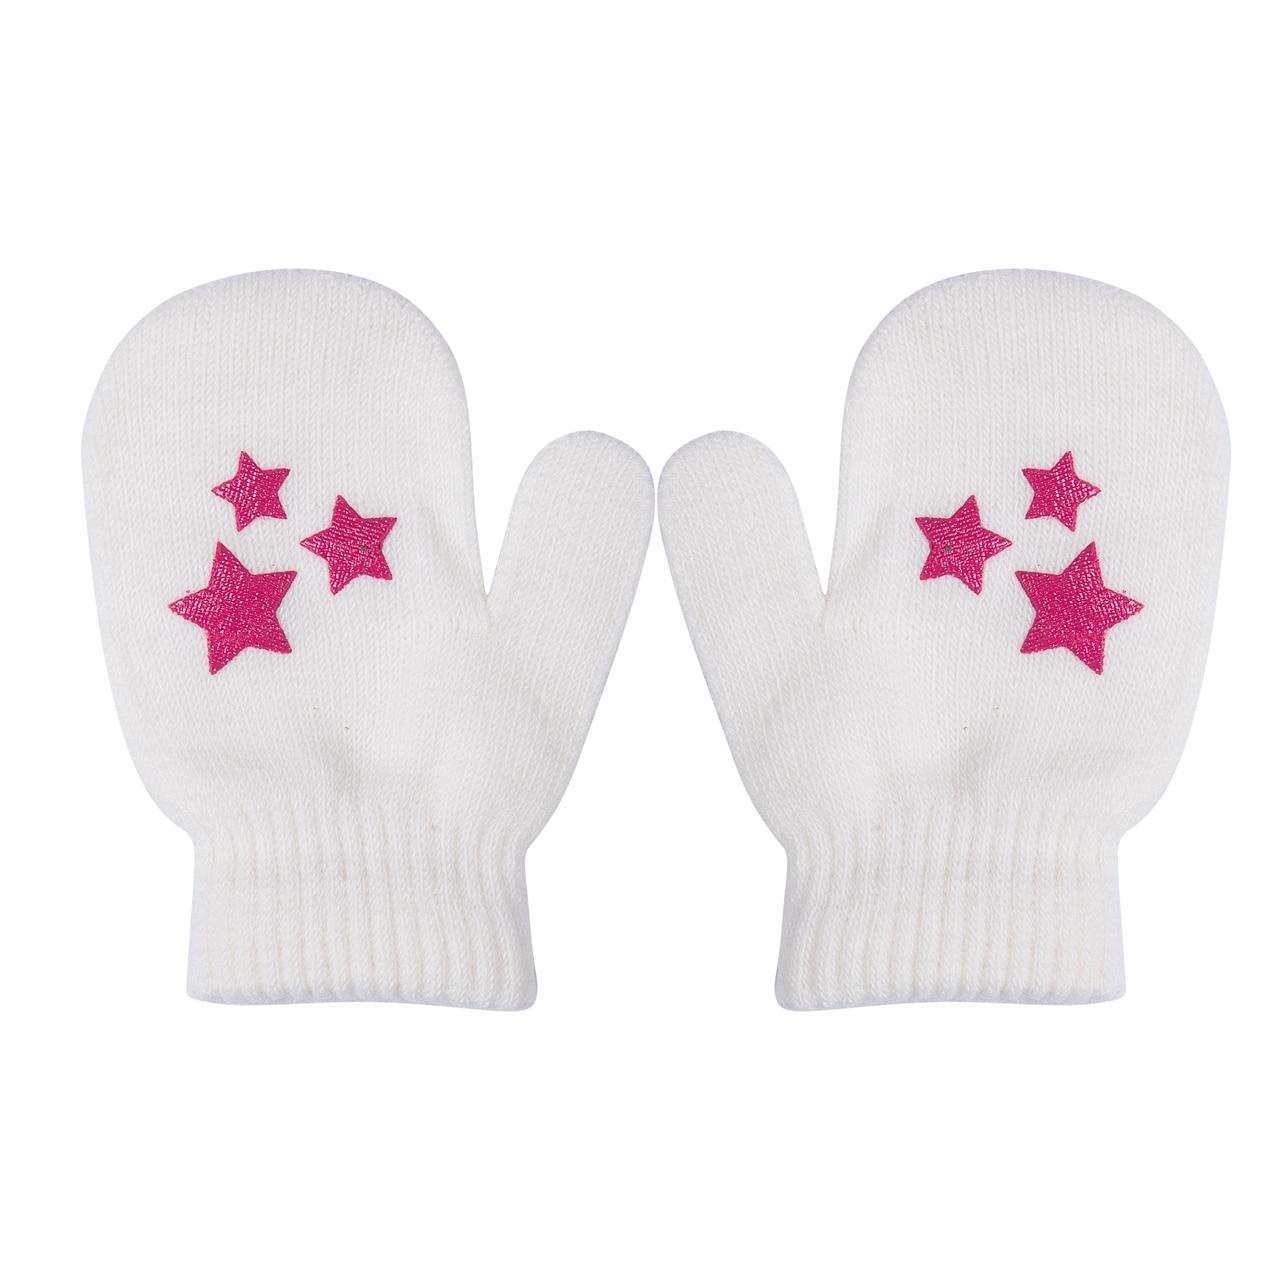 Analytical New Baby Mittens Winter Gloves Cute Cartoon Thicken Hot Infant Baby Handschoenen Girls Boys Of Winter Warm Baby Gloves Gloves & Mittens Mother & Kids